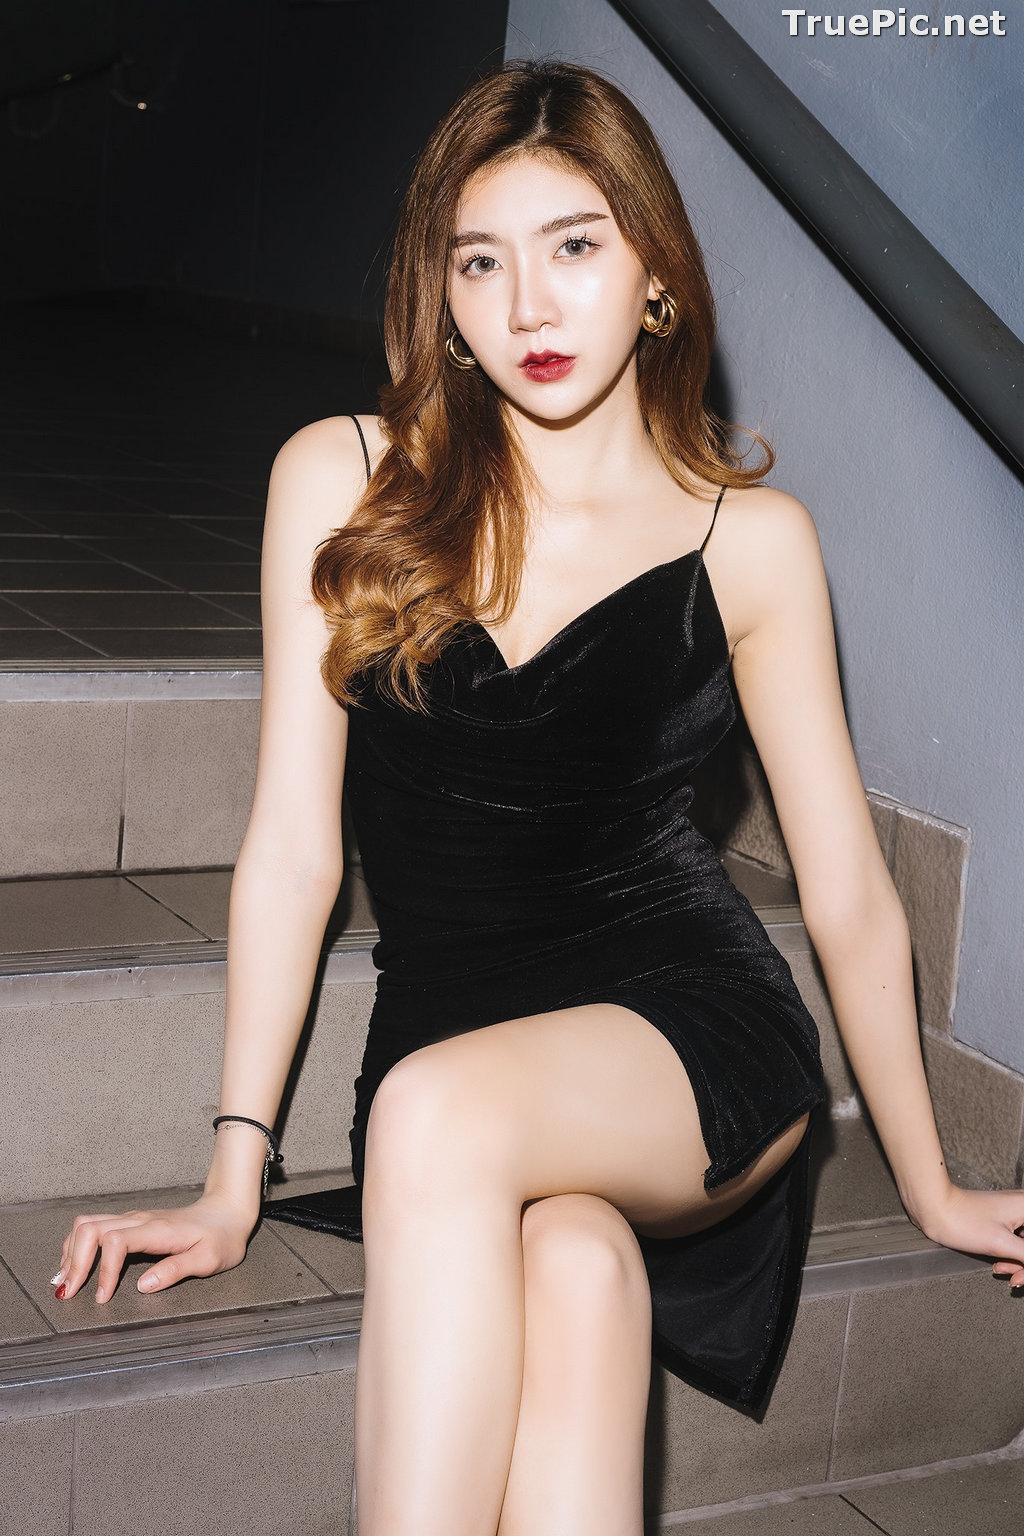 Image Thailand Model - Sasi Ngiunwan - Black For SiamNight - TruePic.net - Picture-34